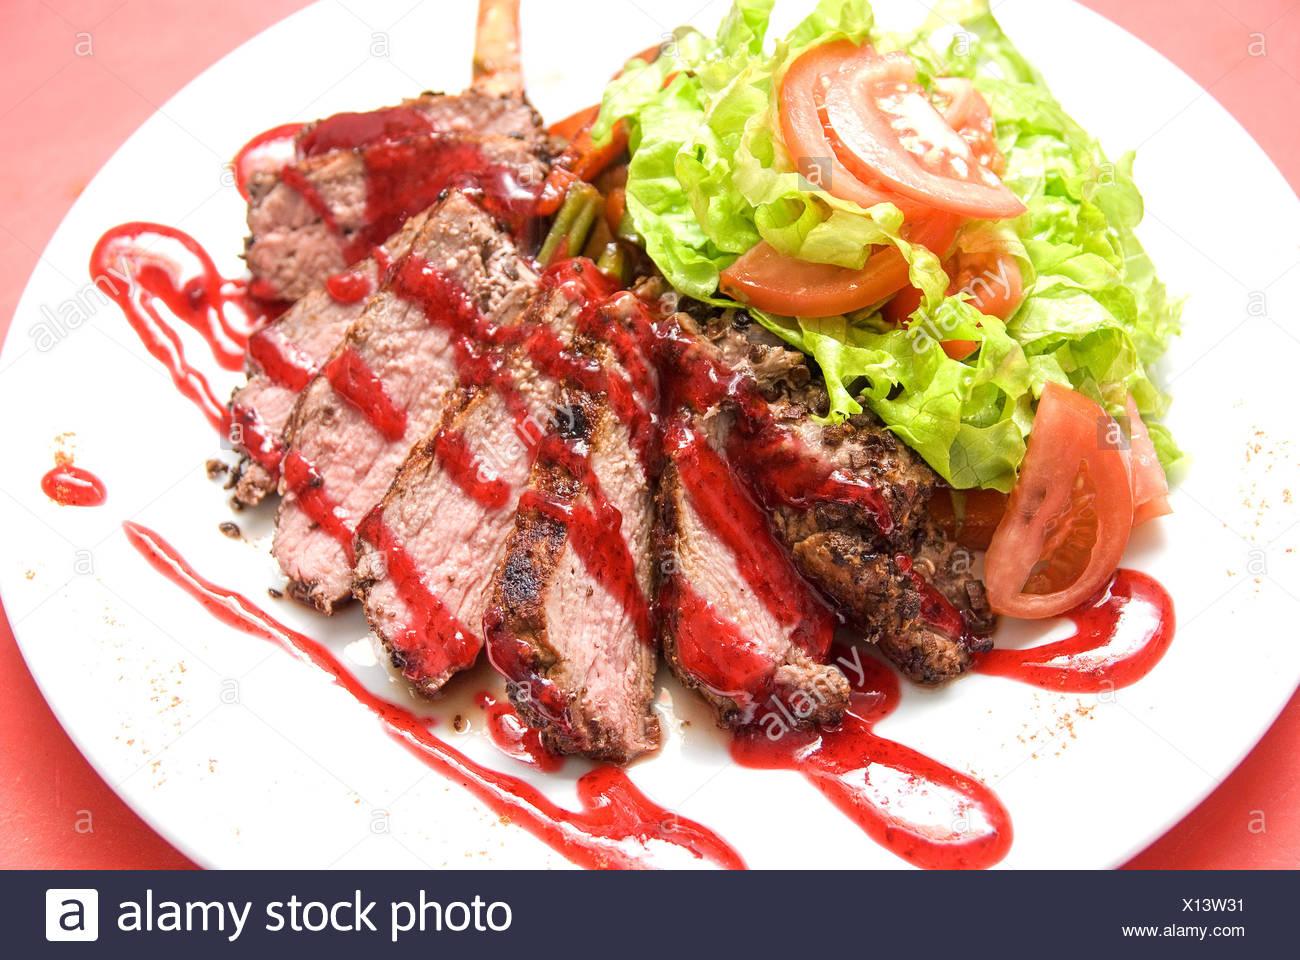 restaurant, food, aliment, pepper, colour, green, coloured